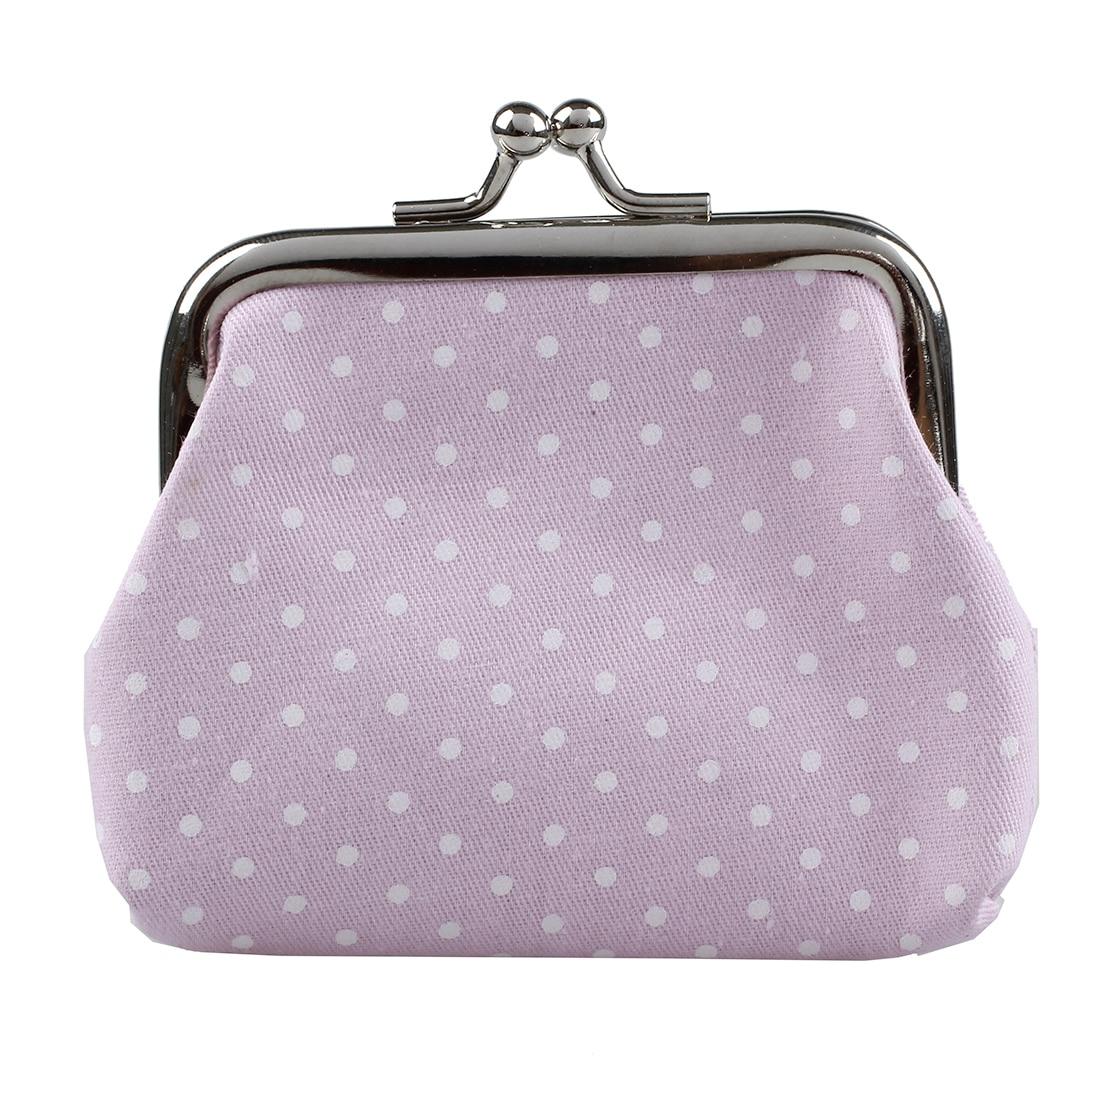 Popular Cute girls Wallet Clutch Change Purse key/coins bag Mini Handbag Pouch Pink